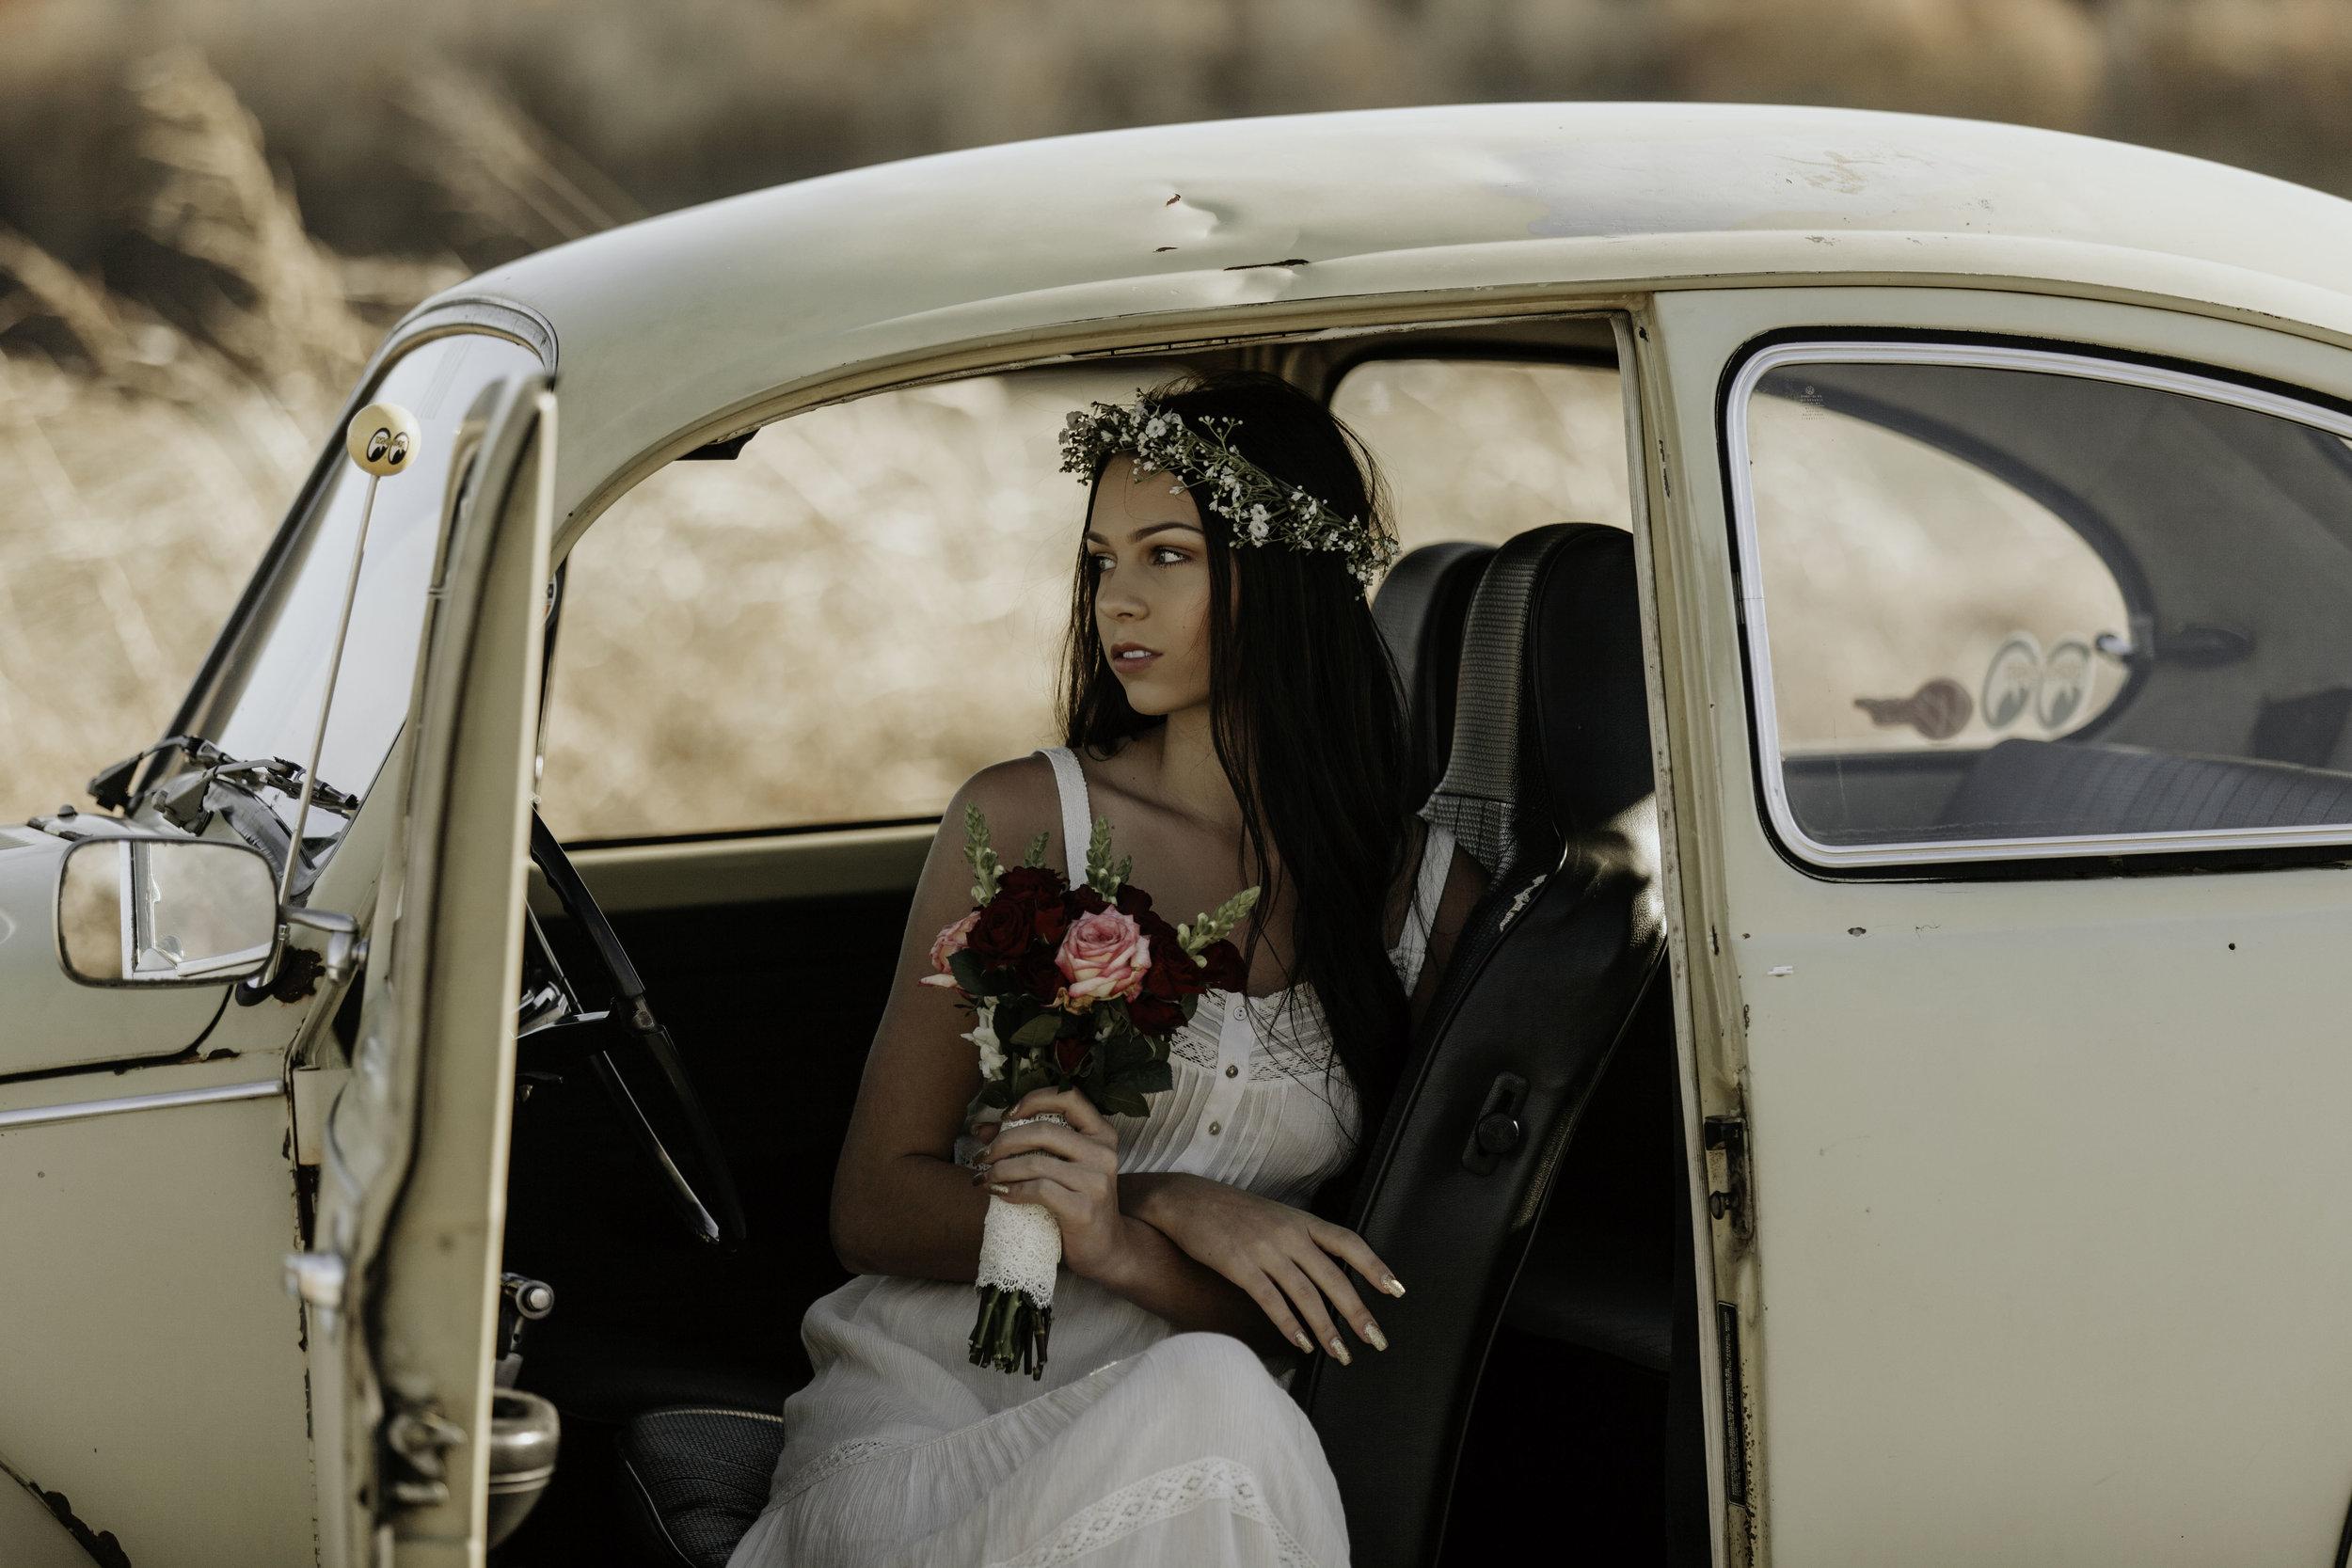 dessert-conway-central-arkansas-bridal-photographer-little-rock-photography-outdoor-wedding-boho-fashion-engagement-elopement-bouquet-bride-soiree-magazine-photoshoot-arkansasbride-pinnacle-mountain-car-vintage (2).jpe